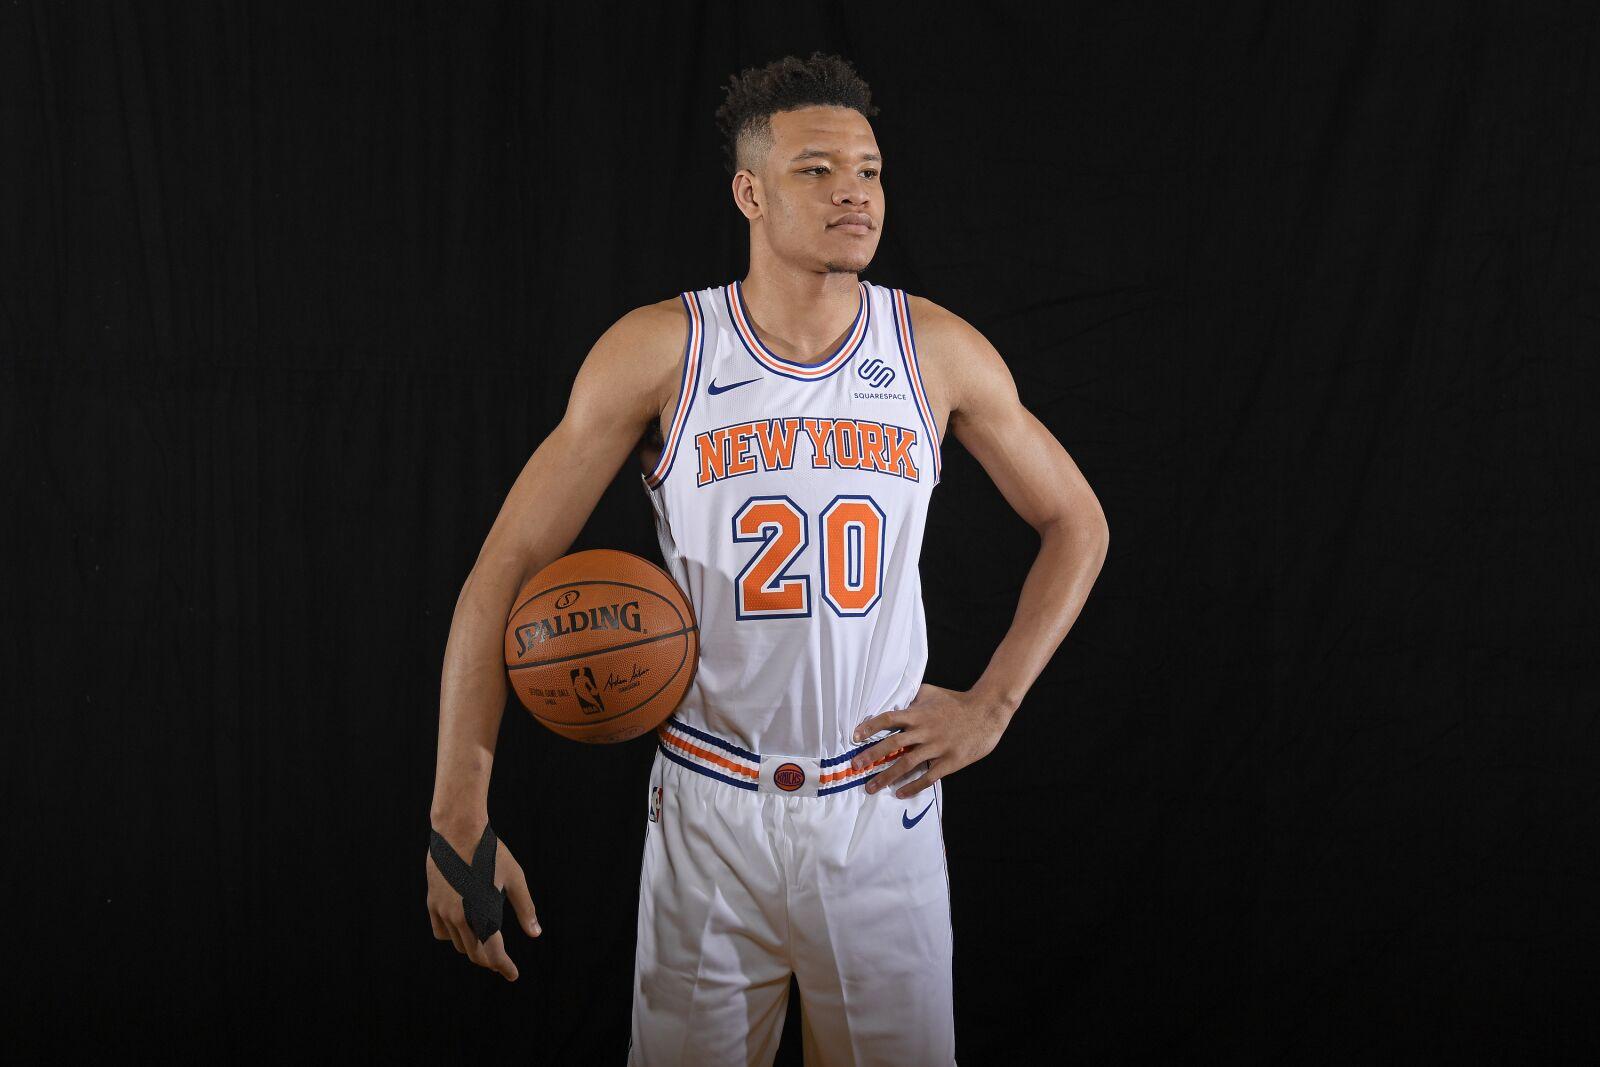 ea9542bdf17 New York Knicks  Best candidates for 2018-19 NBA awards